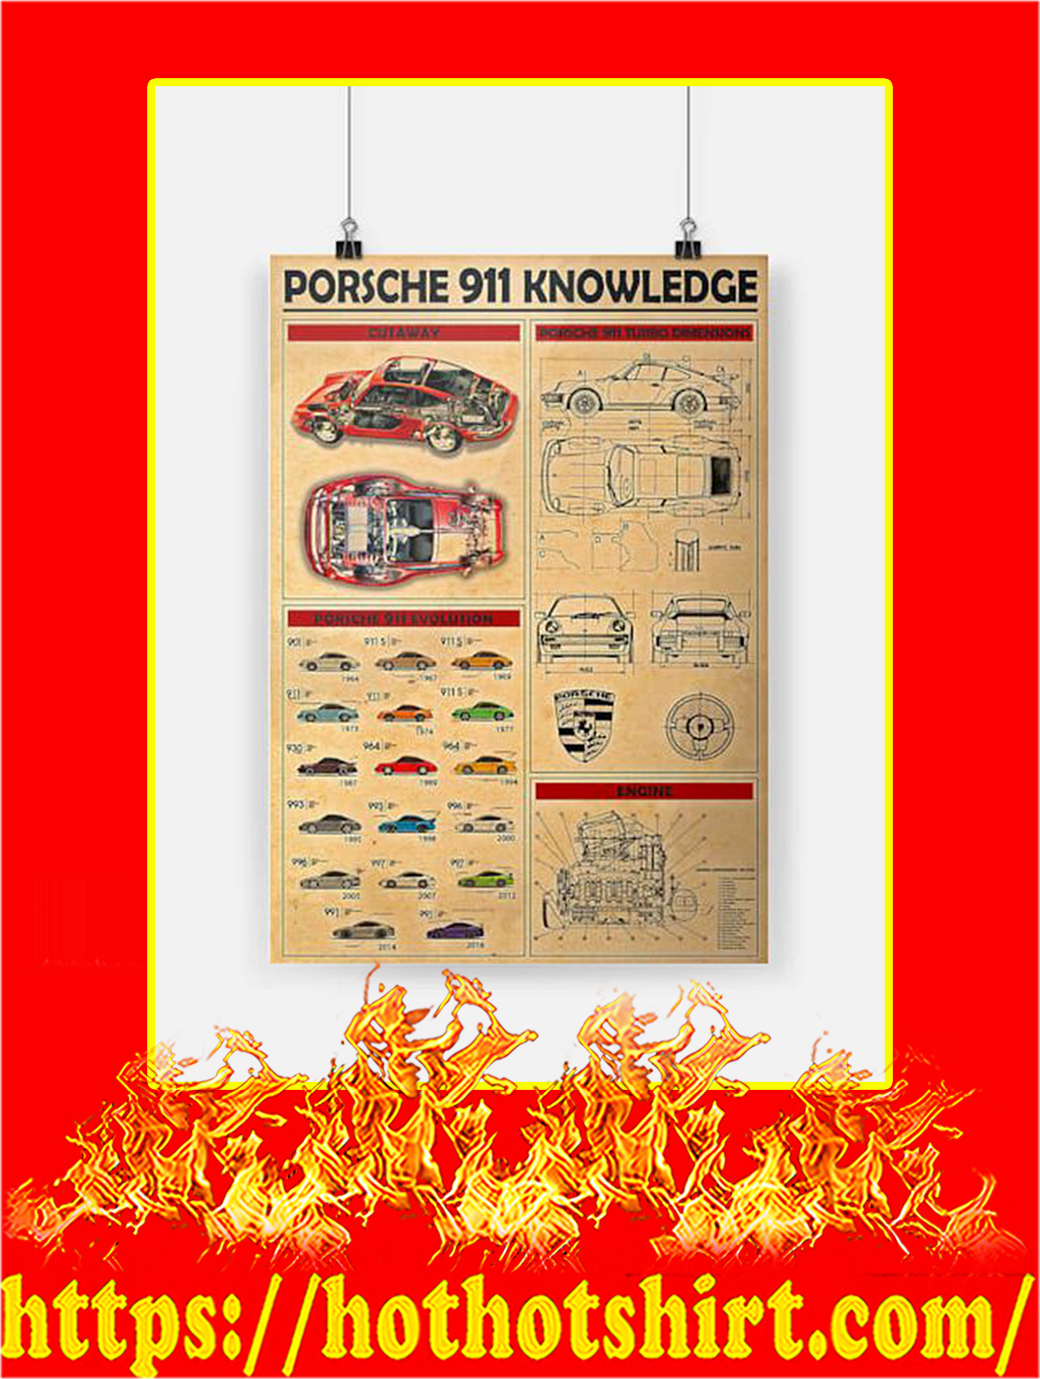 Porsche 911 Knowledge Poster - A3